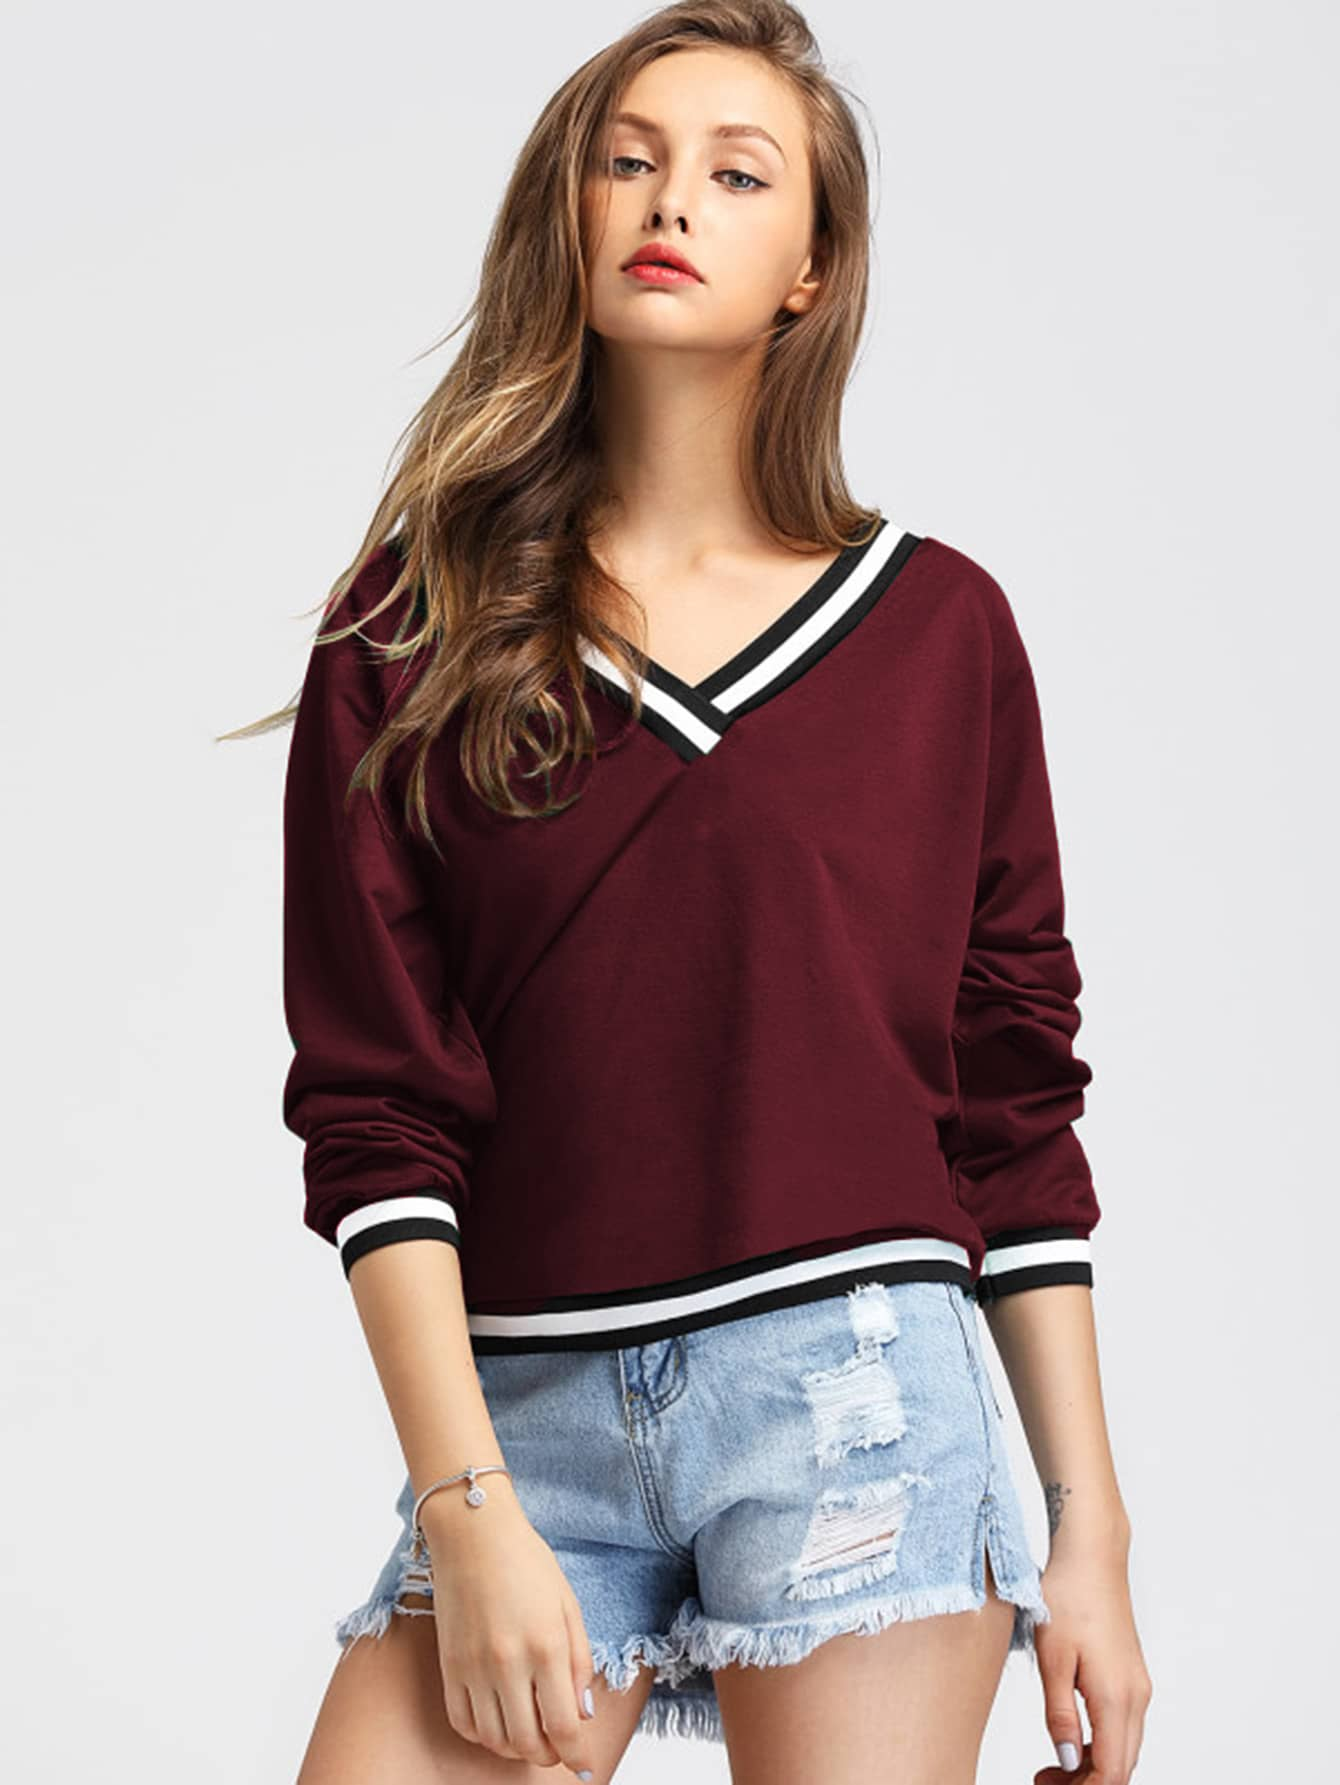 Contrast Striped Trim V-neckline Sweatshirt contrast striped v neckline flute sleeve blouse